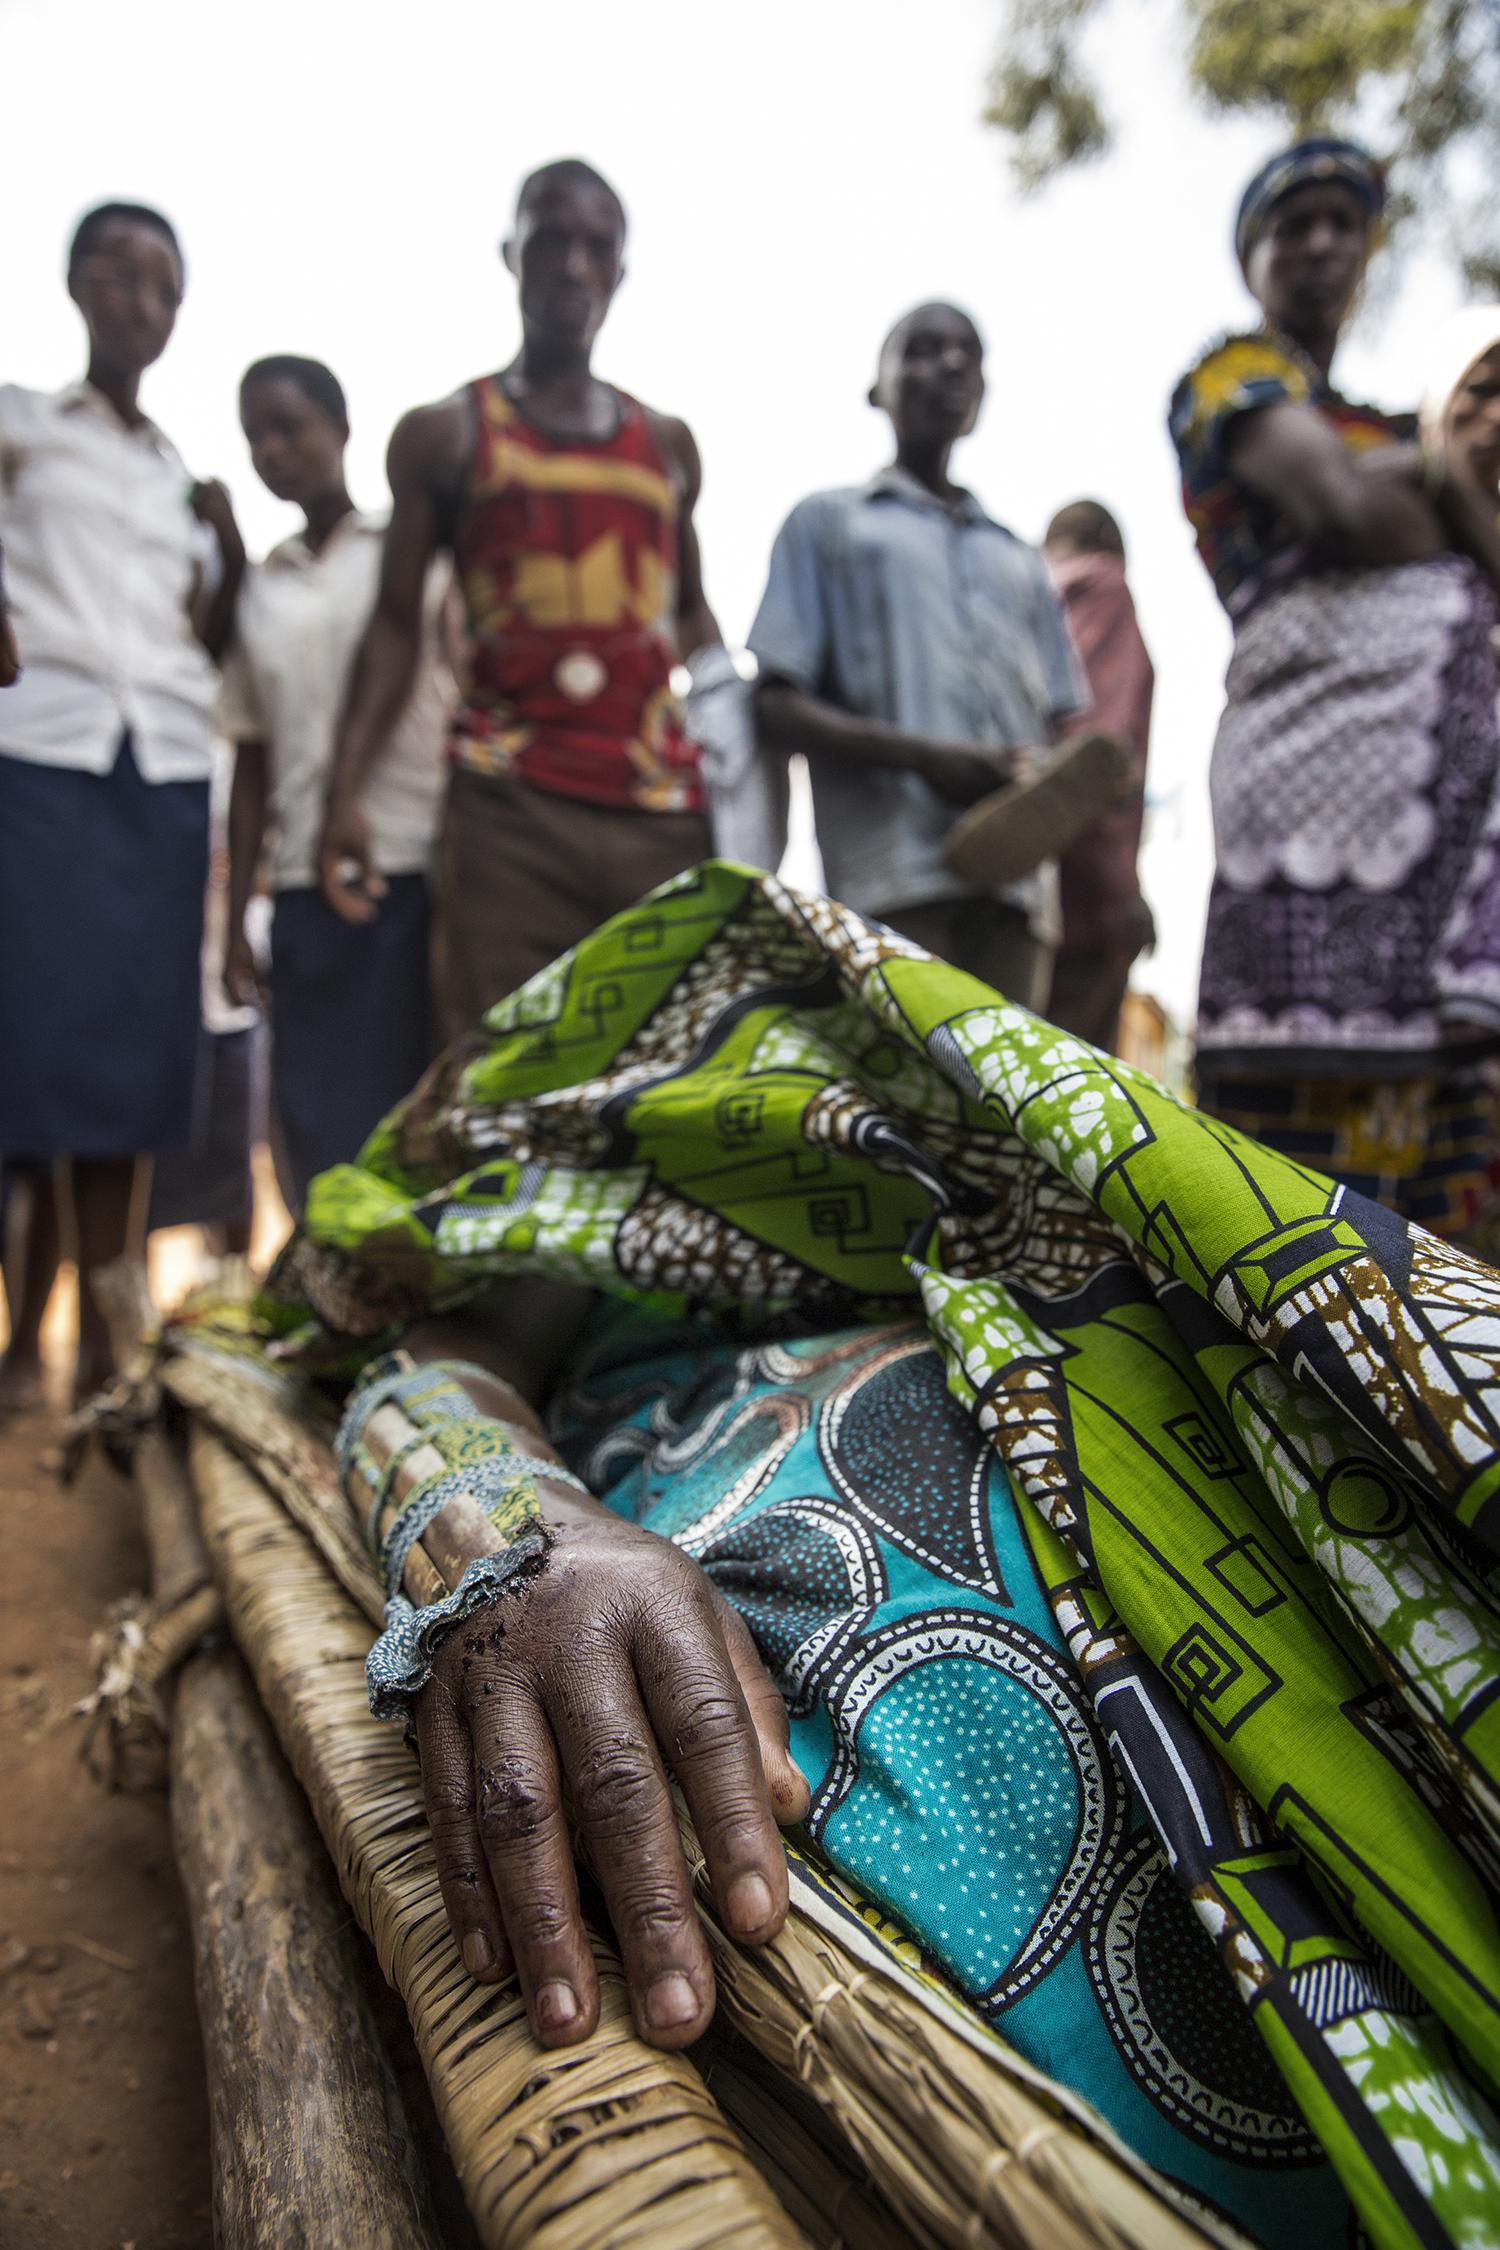 201606_Oxfam_Novib_Peace_Beyond_Borders_Burundi_Rwanda_Congo_DRC_Jeppe_Schilder_08.jpg